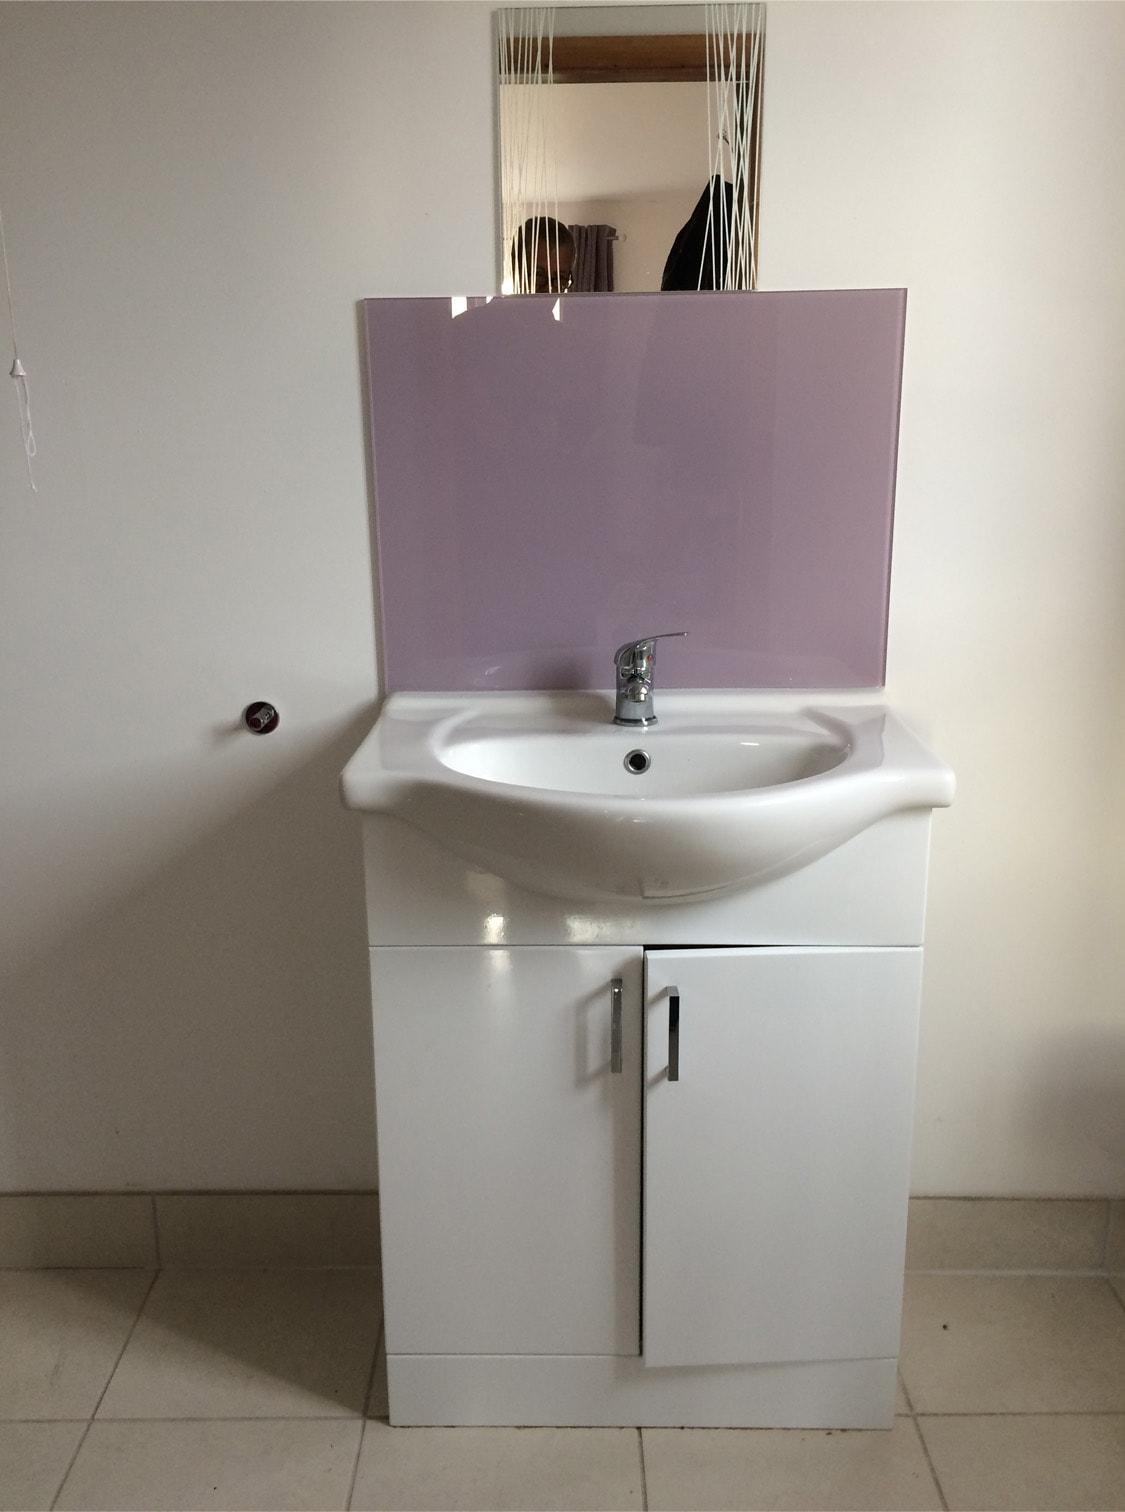 Glass splashbacks for bathroom sinks - Glass Splashbacks For Bathroom Sinks 38